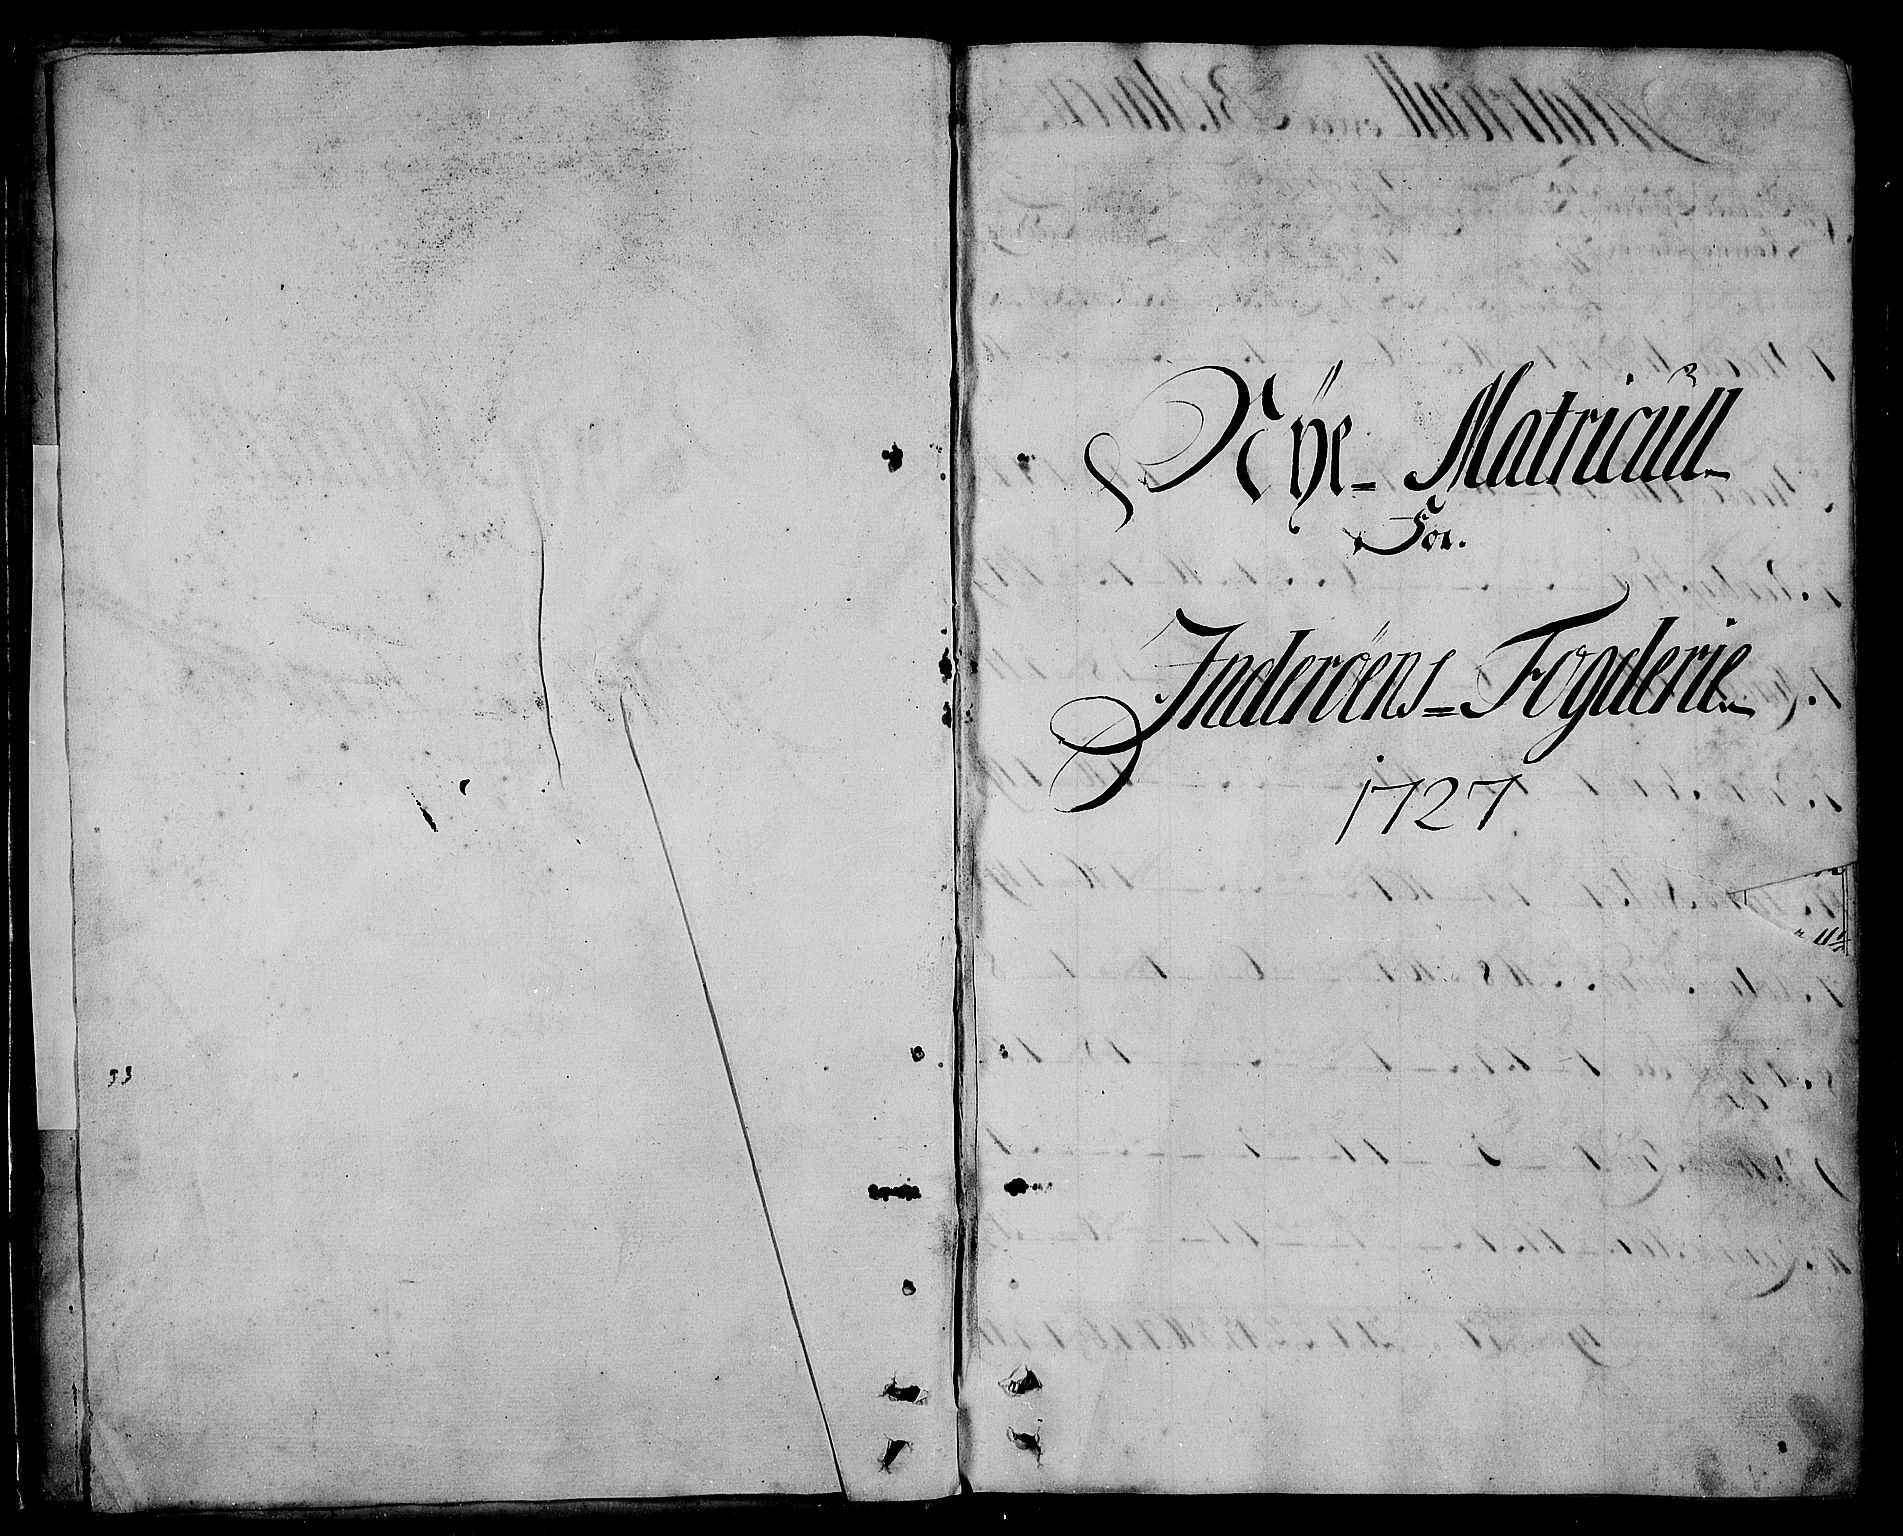 RA, Rentekammeret inntil 1814, Realistisk ordnet avdeling, N/Nb/Nbf/L0167: Inderøy matrikkelprotokoll, 1723, s. upaginert